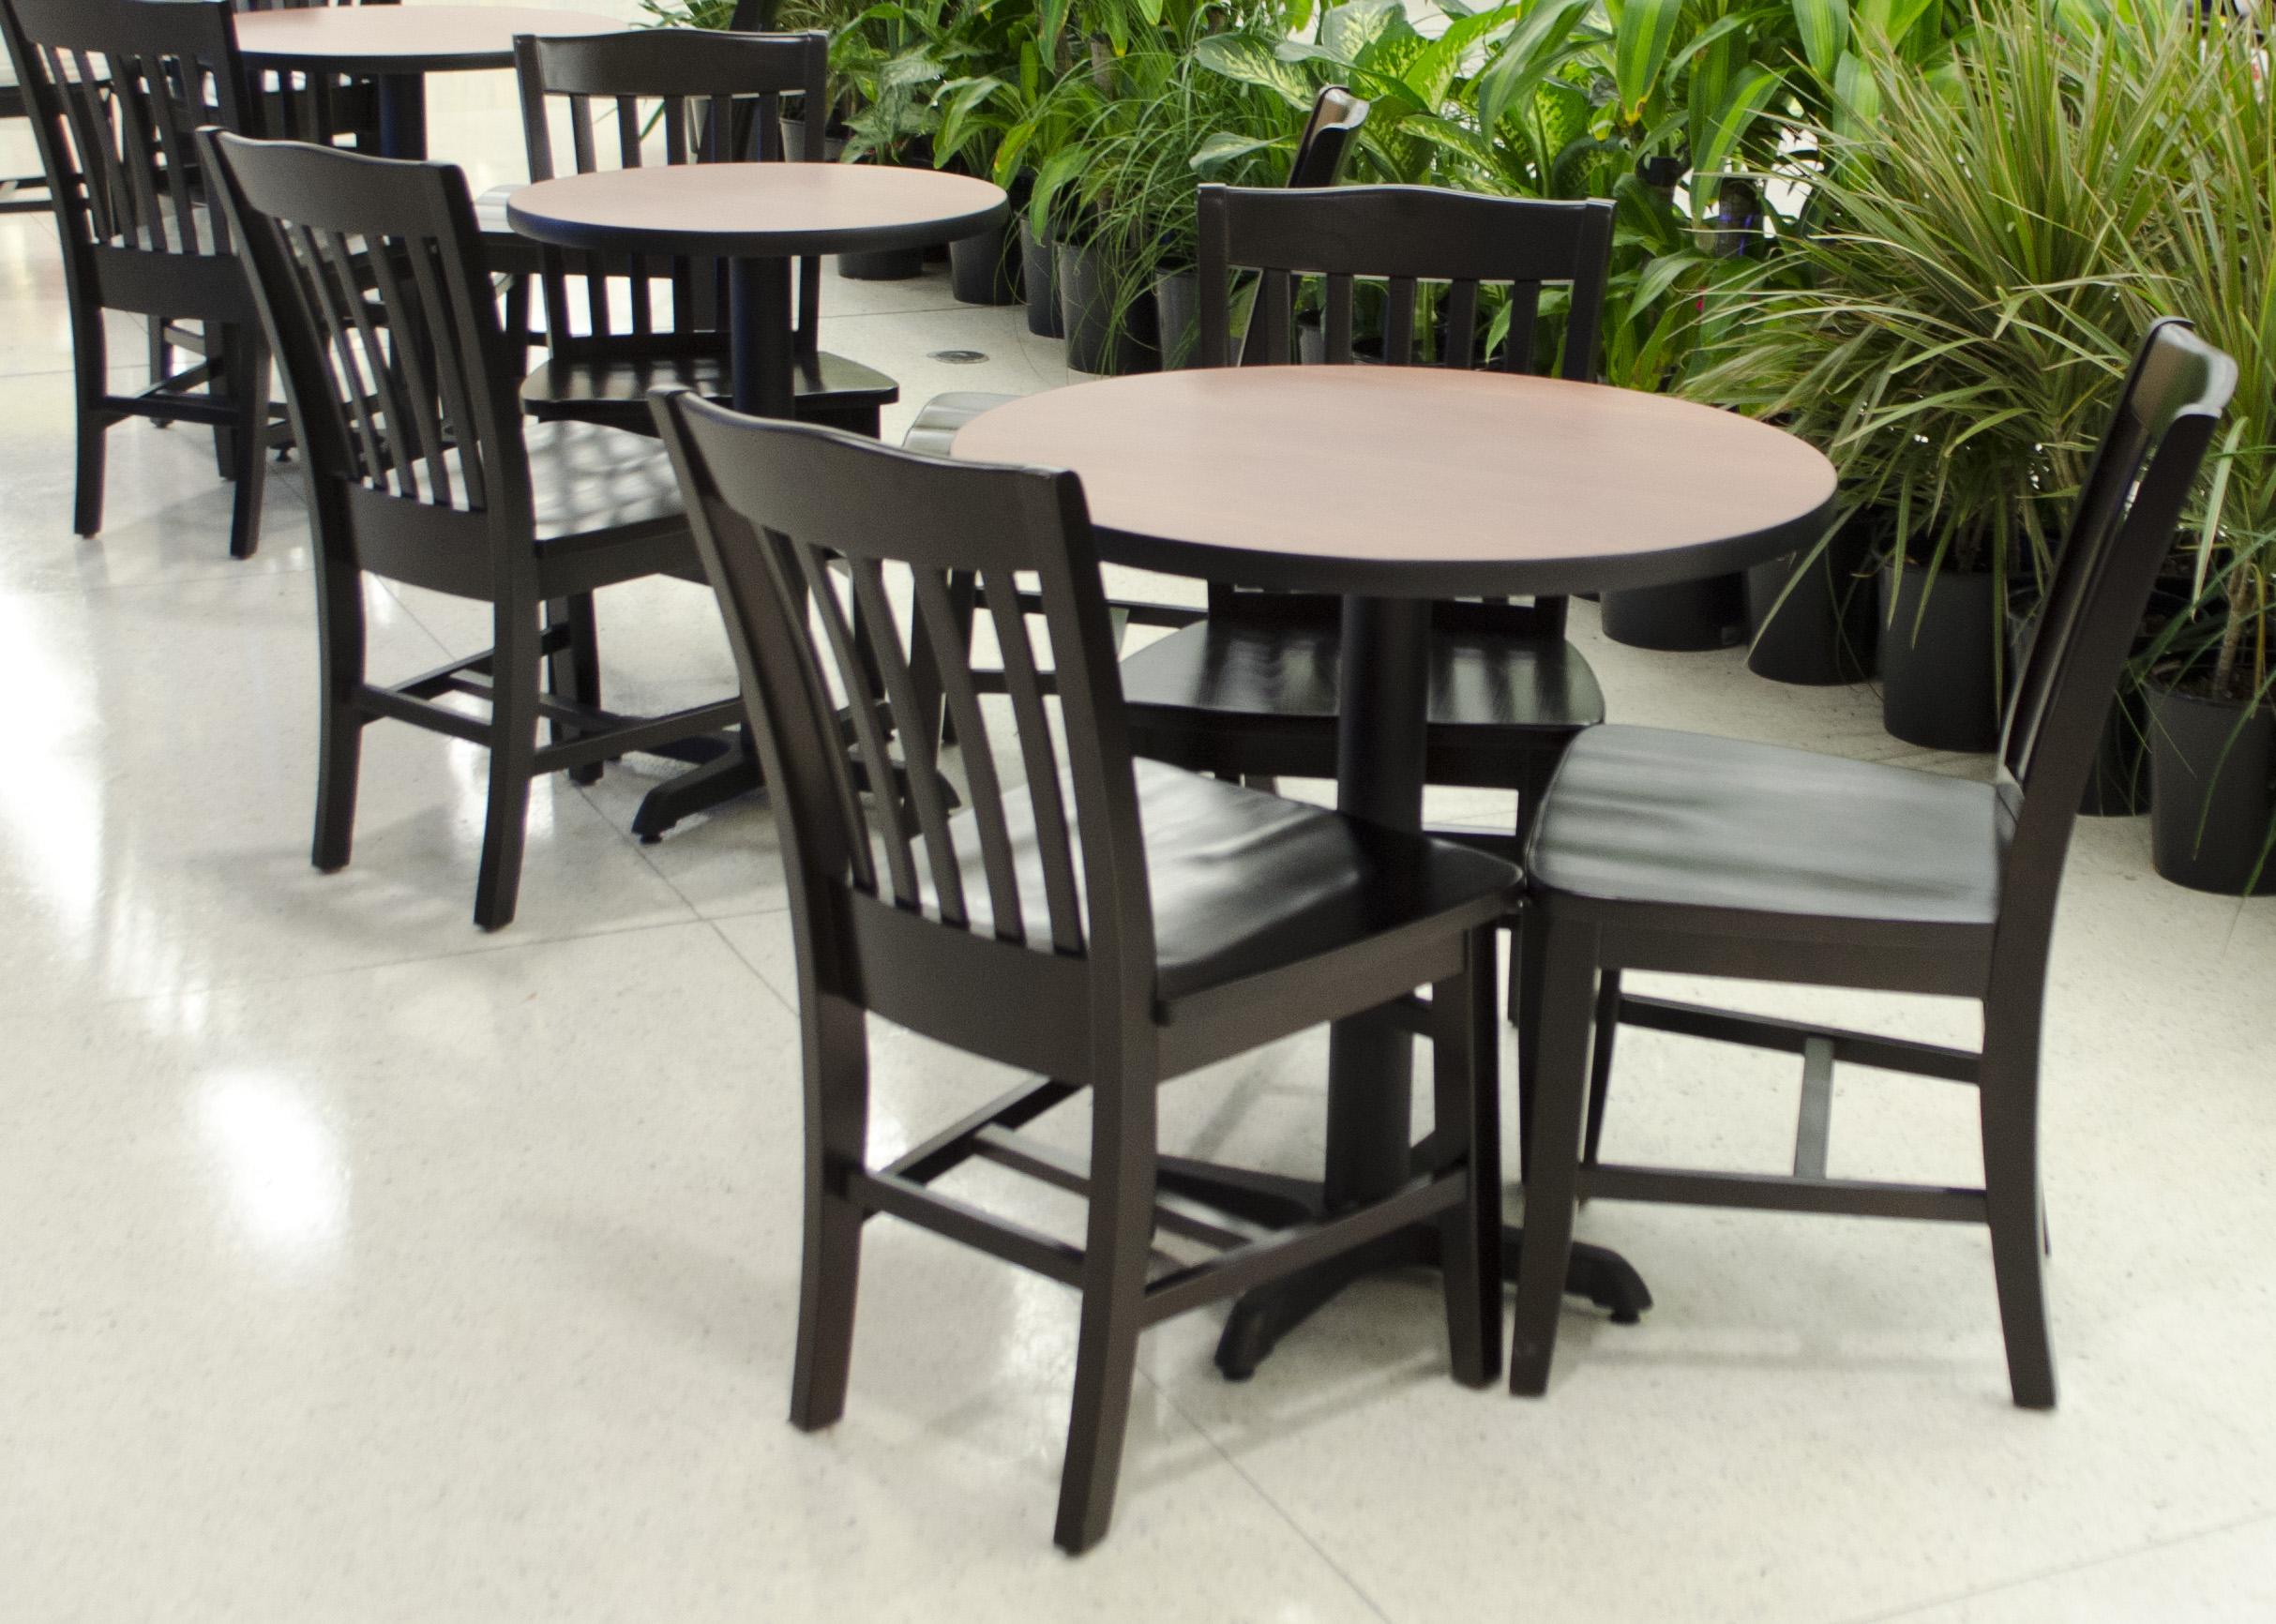 Vinyl Edge Table Tops Laminate Restaurant Table Tops Plymold - Outdoor table tops restaurant